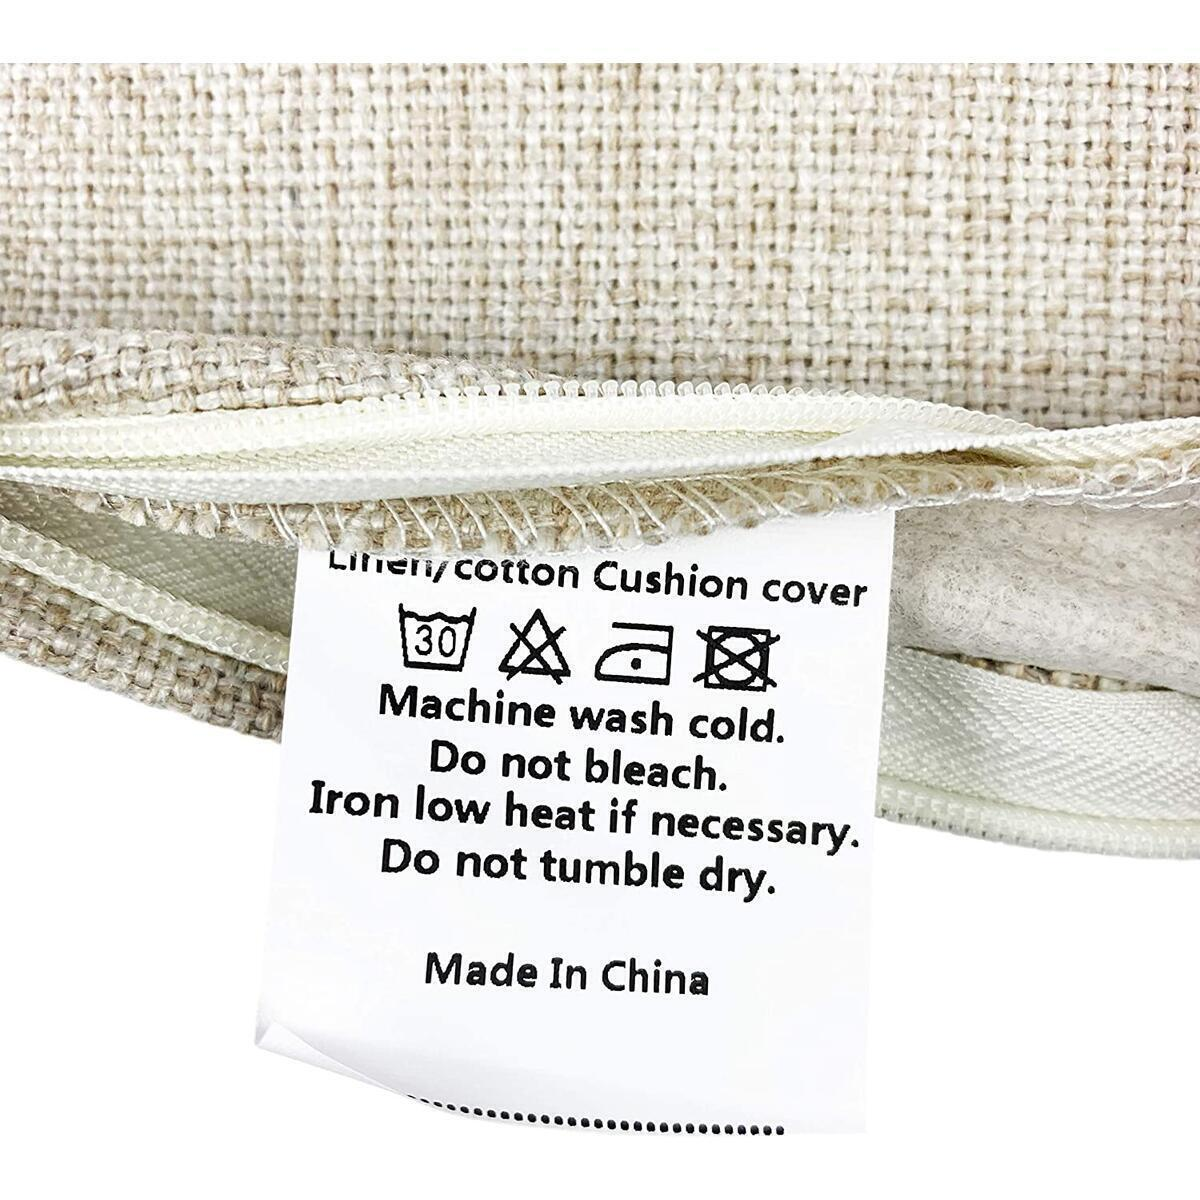 DrupsCo 18x18 Hummingbird Pillow Cover, Cotton Linen Hummingbird Pillow Case, Cabin Decorative Pillows